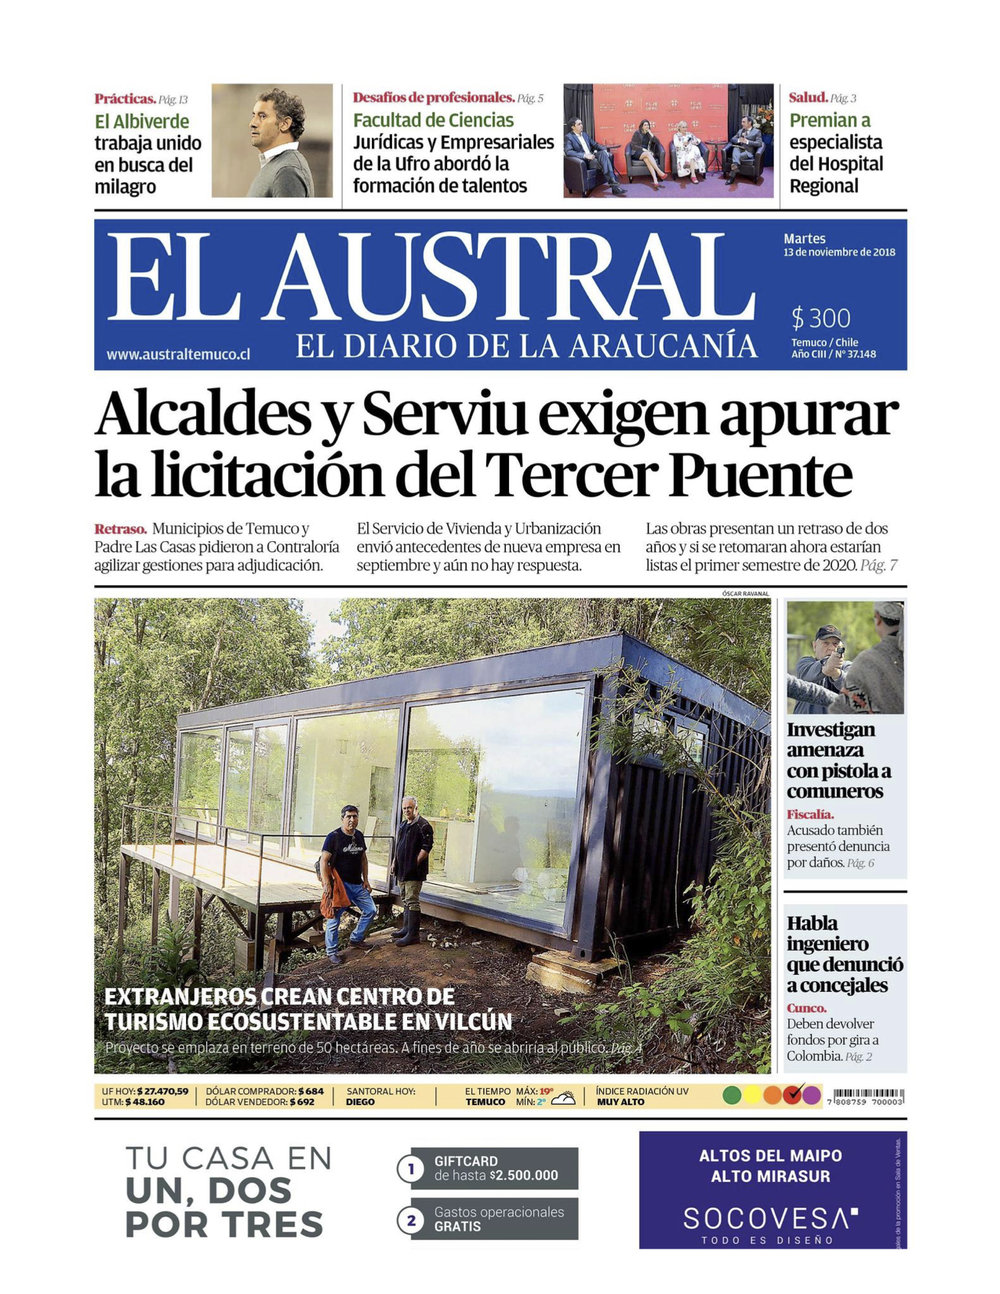 SAMADHI ECO RESORT EL AUSTRAL NEWSPAPER 2018